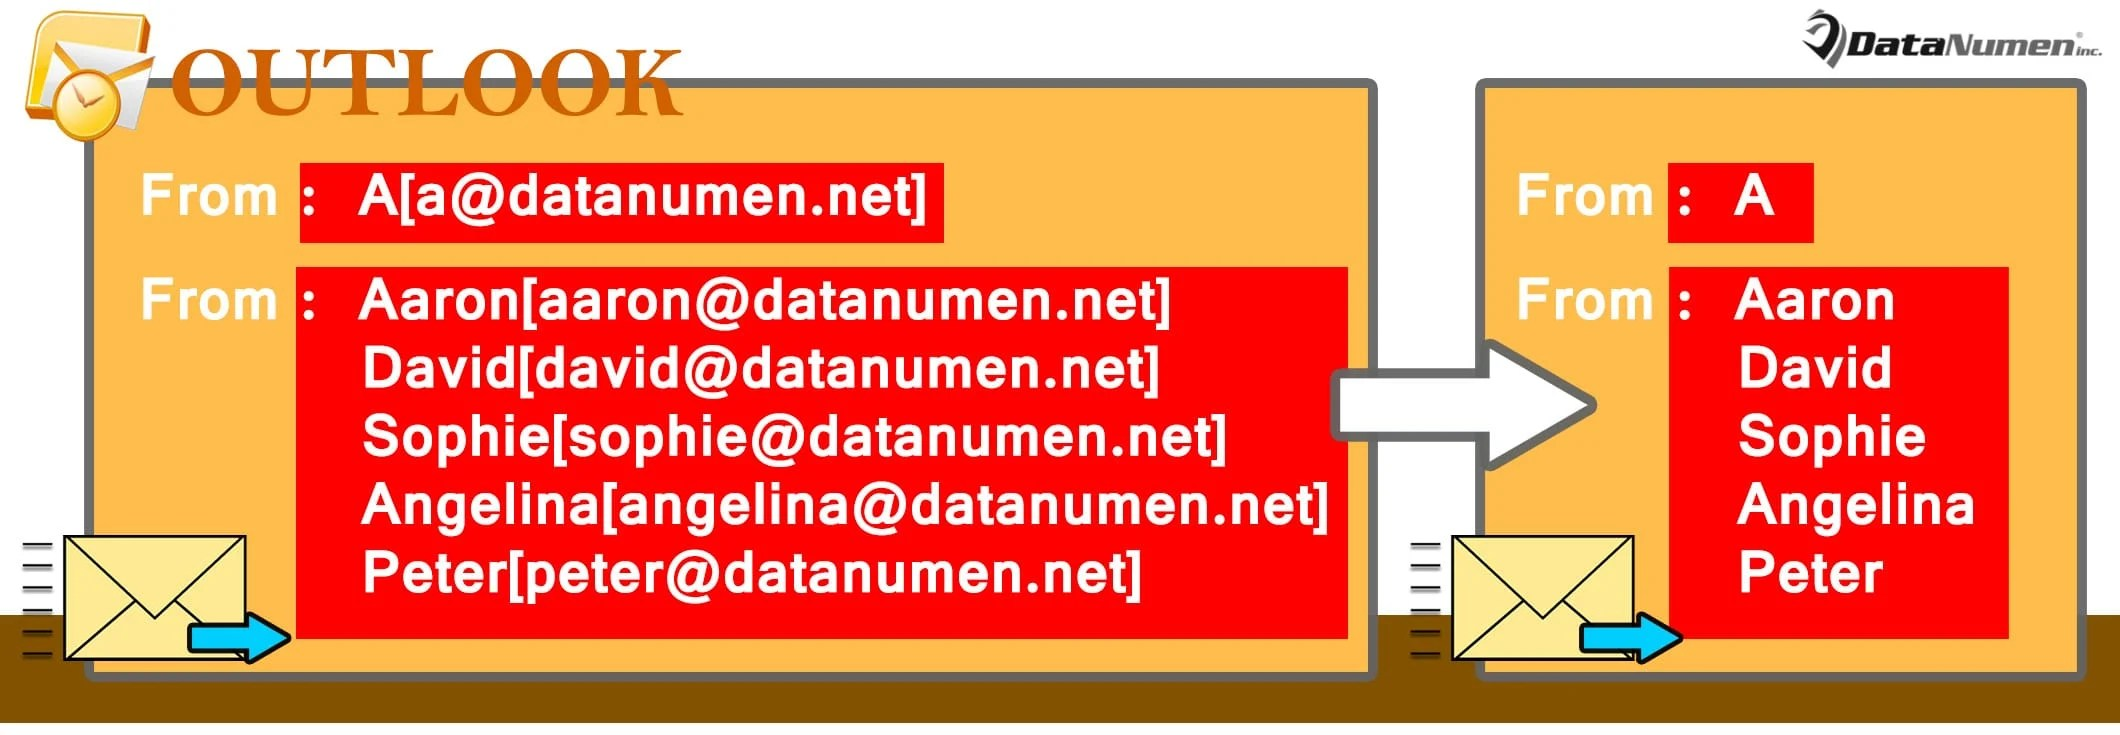 How to Auto Remove the Email Addresses of Original Sender